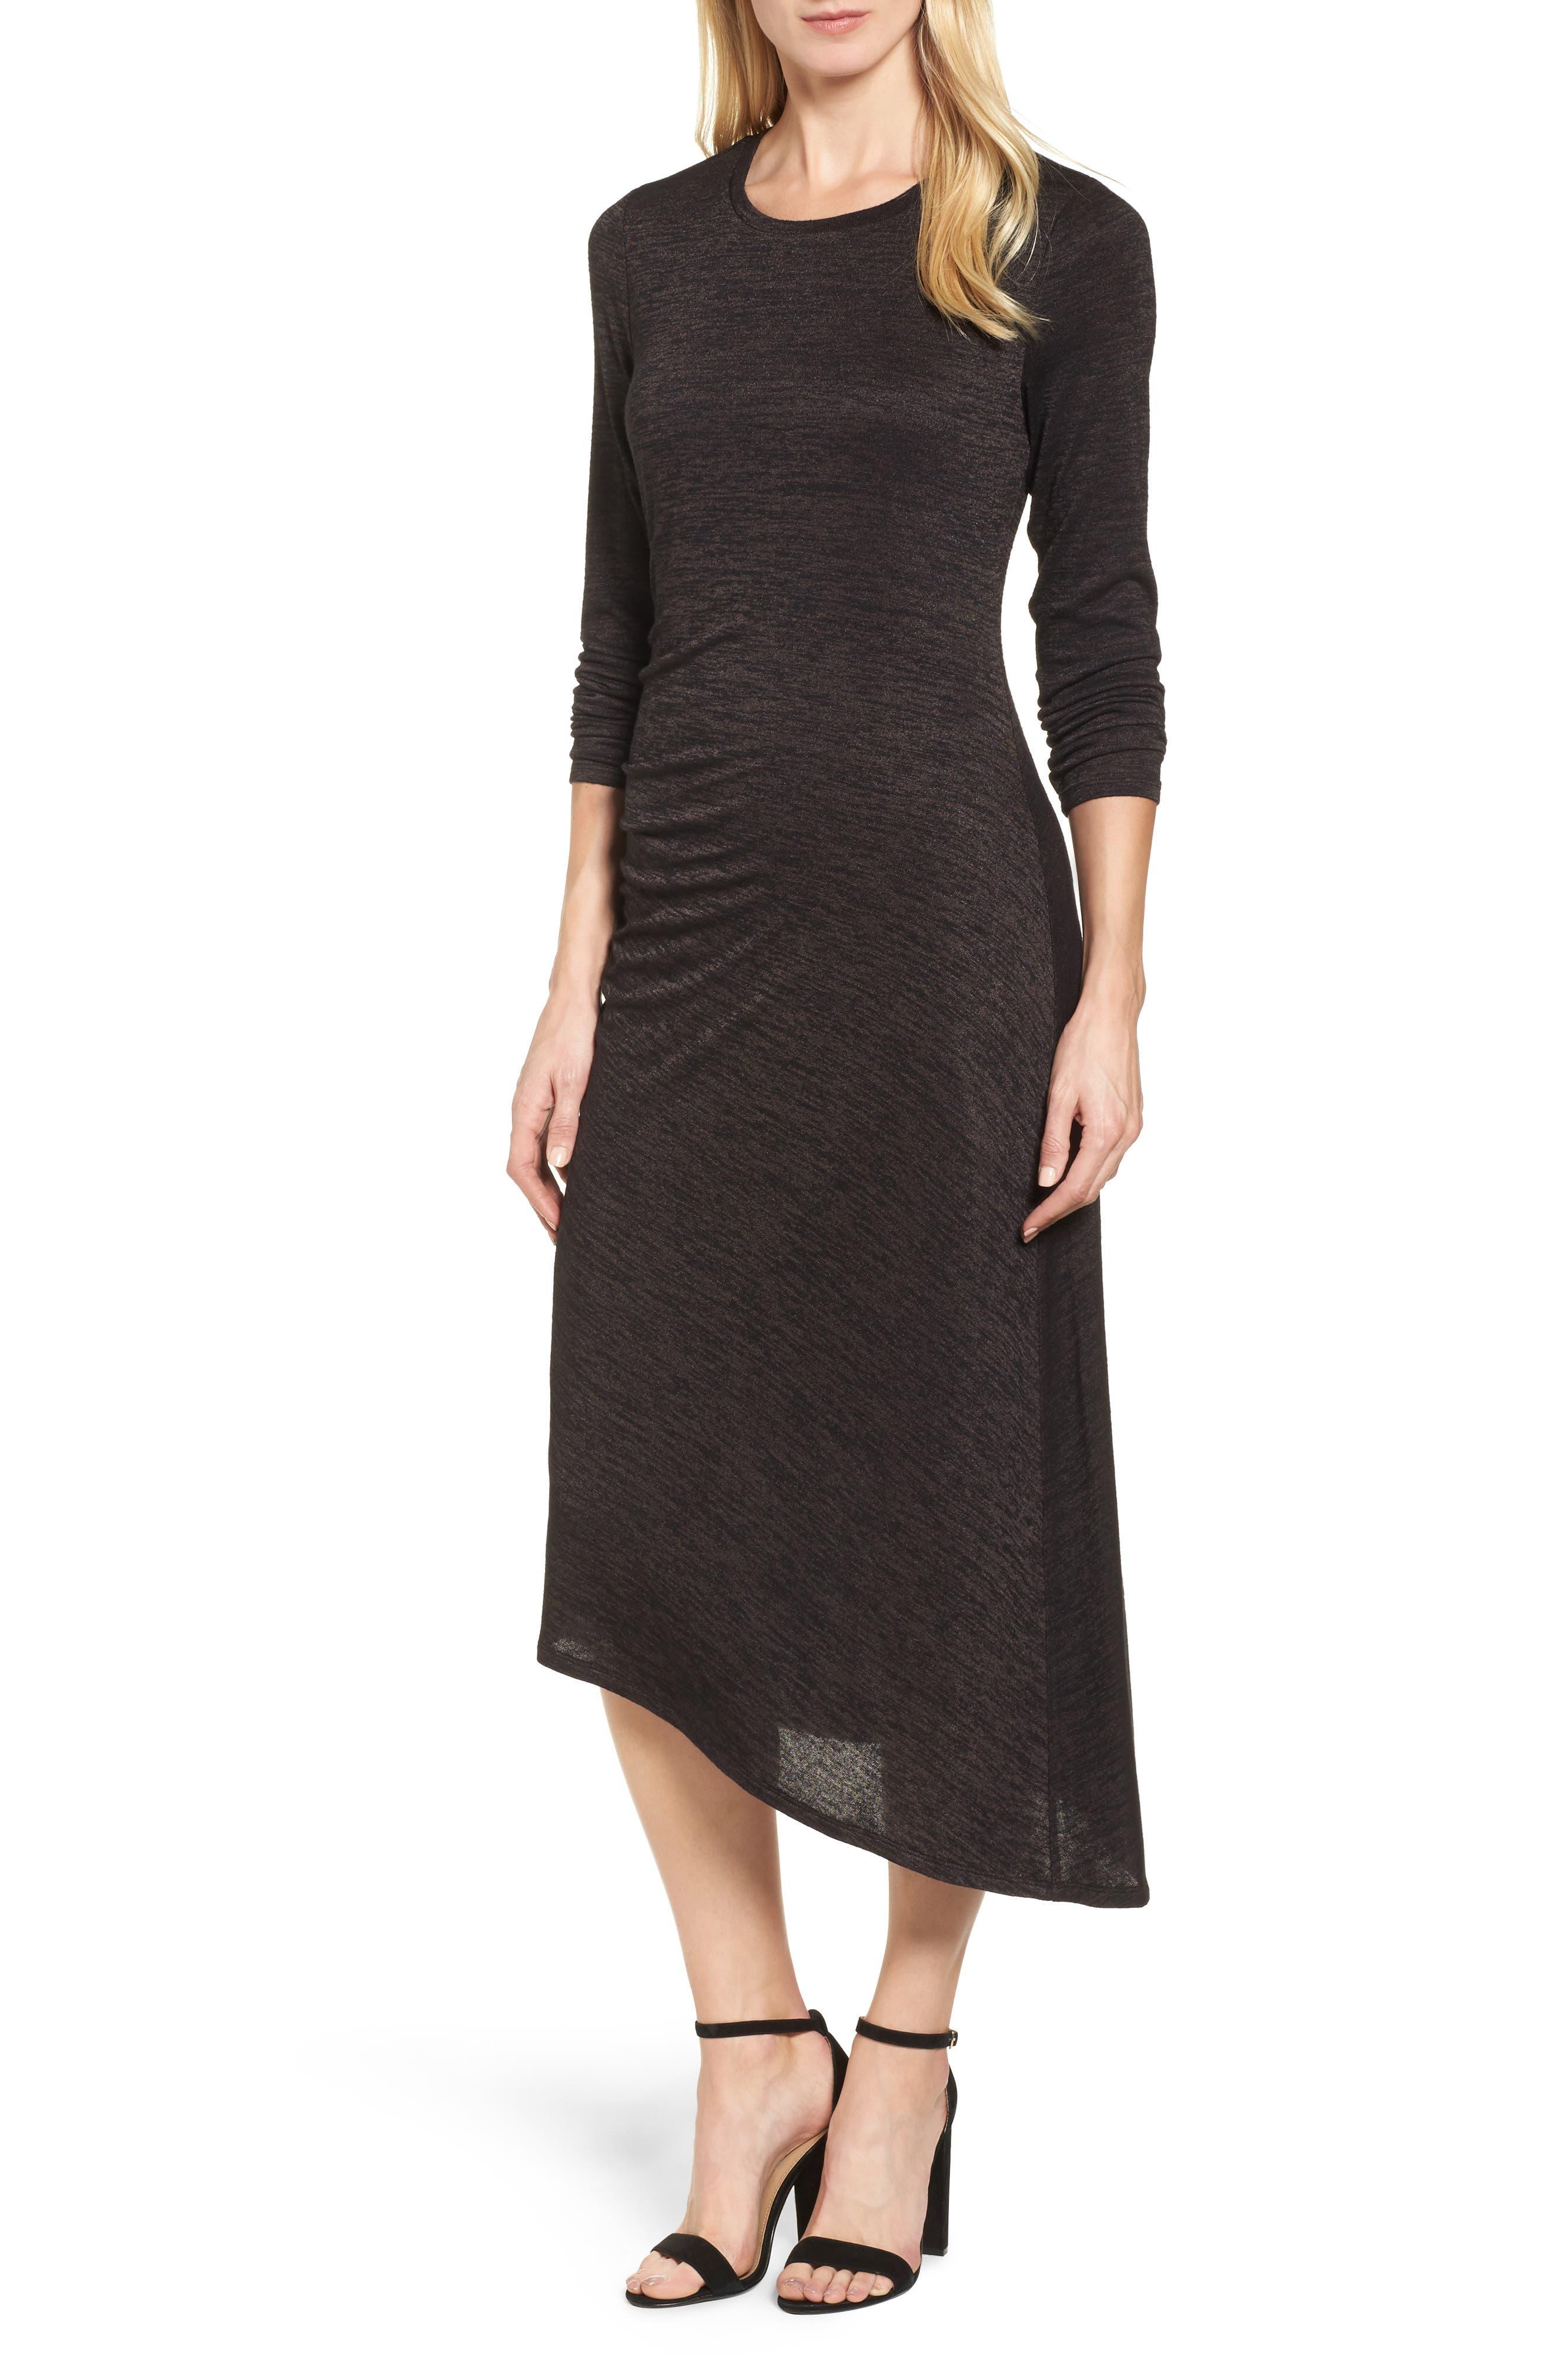 Alternate Image 1 Selected - NIC+ZOE Firelight Midi Dress (Regular & Petite)